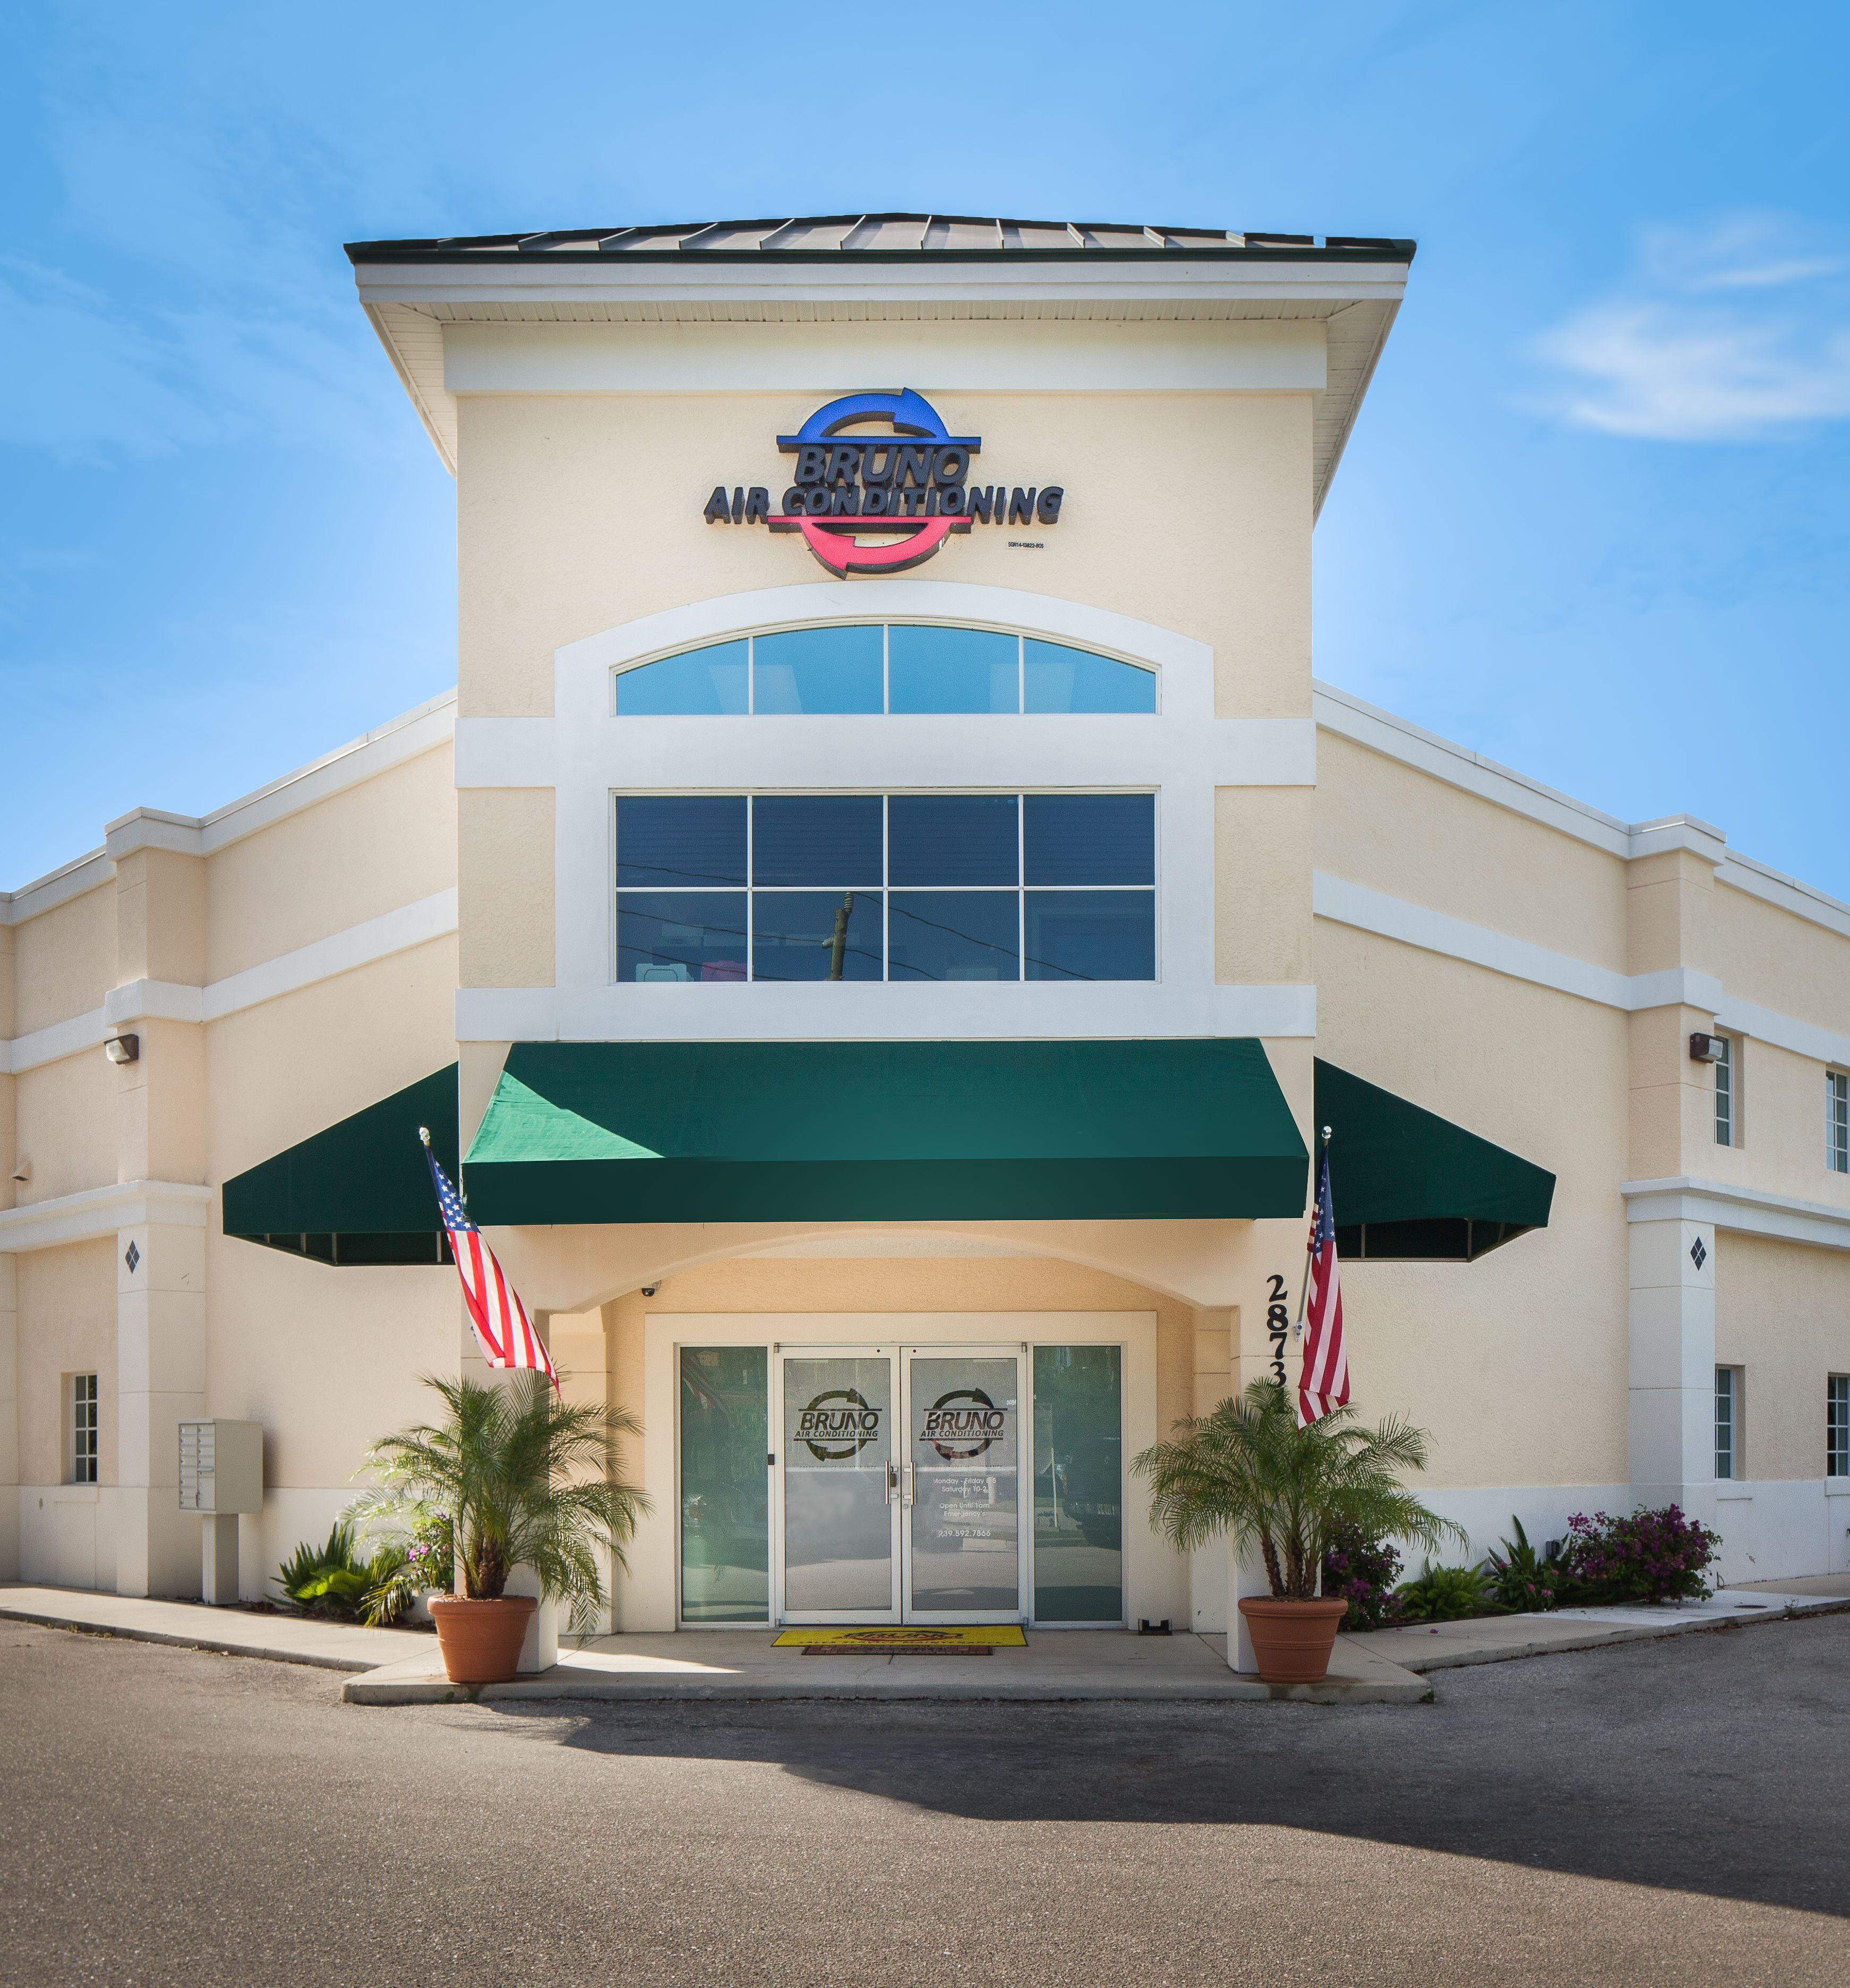 Bruno Air Conditioning Building Bonita Springs, FL